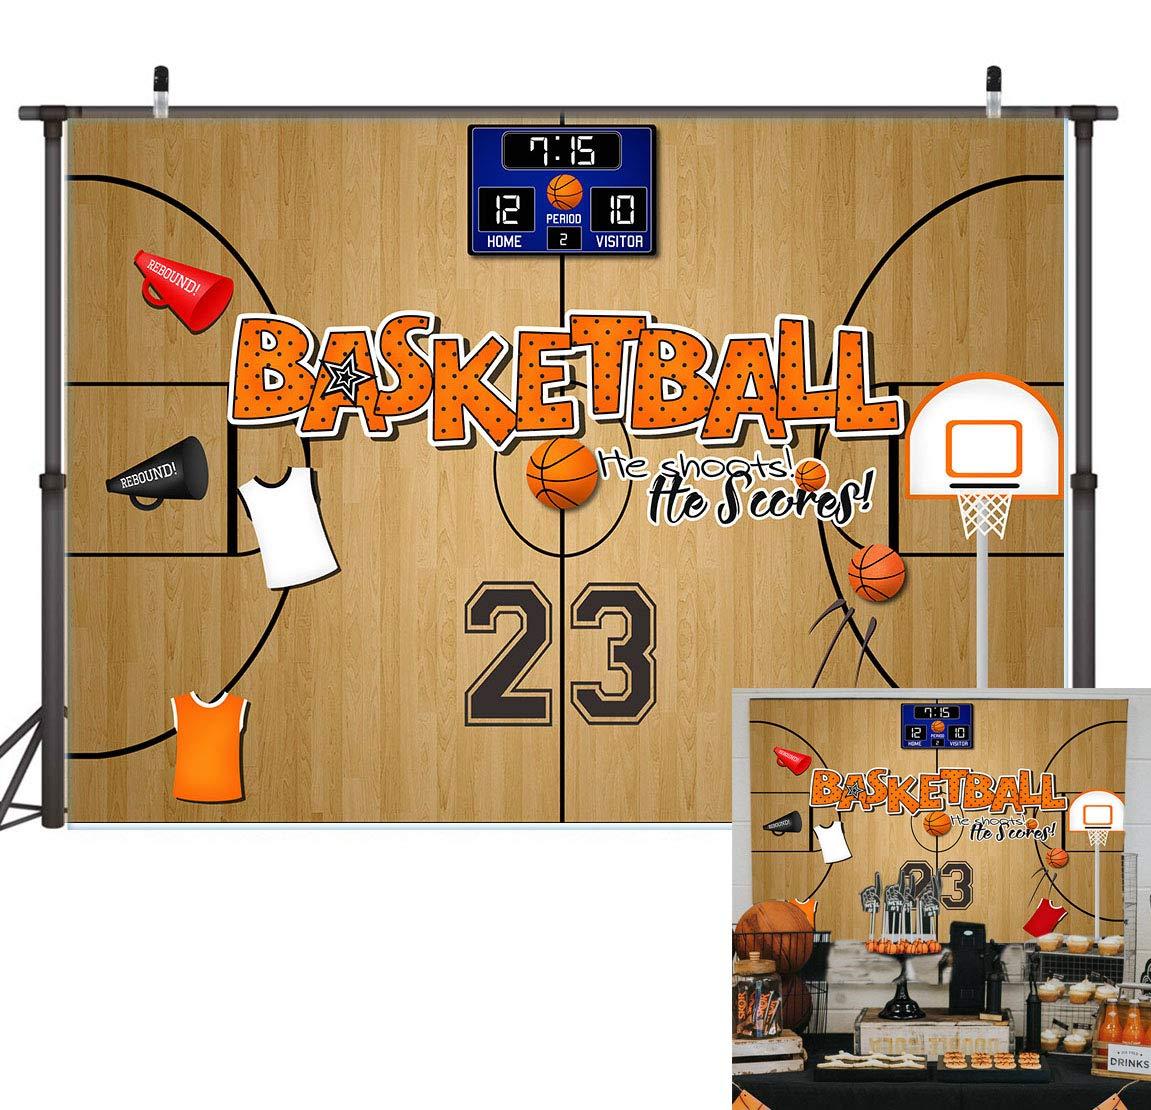 Leowefowa 7X5FT Vinyl Photography Backdrop Interior Basketball Field Stage Lights Sports Theme Background Kids Children Boys Adults Photo Studio Props